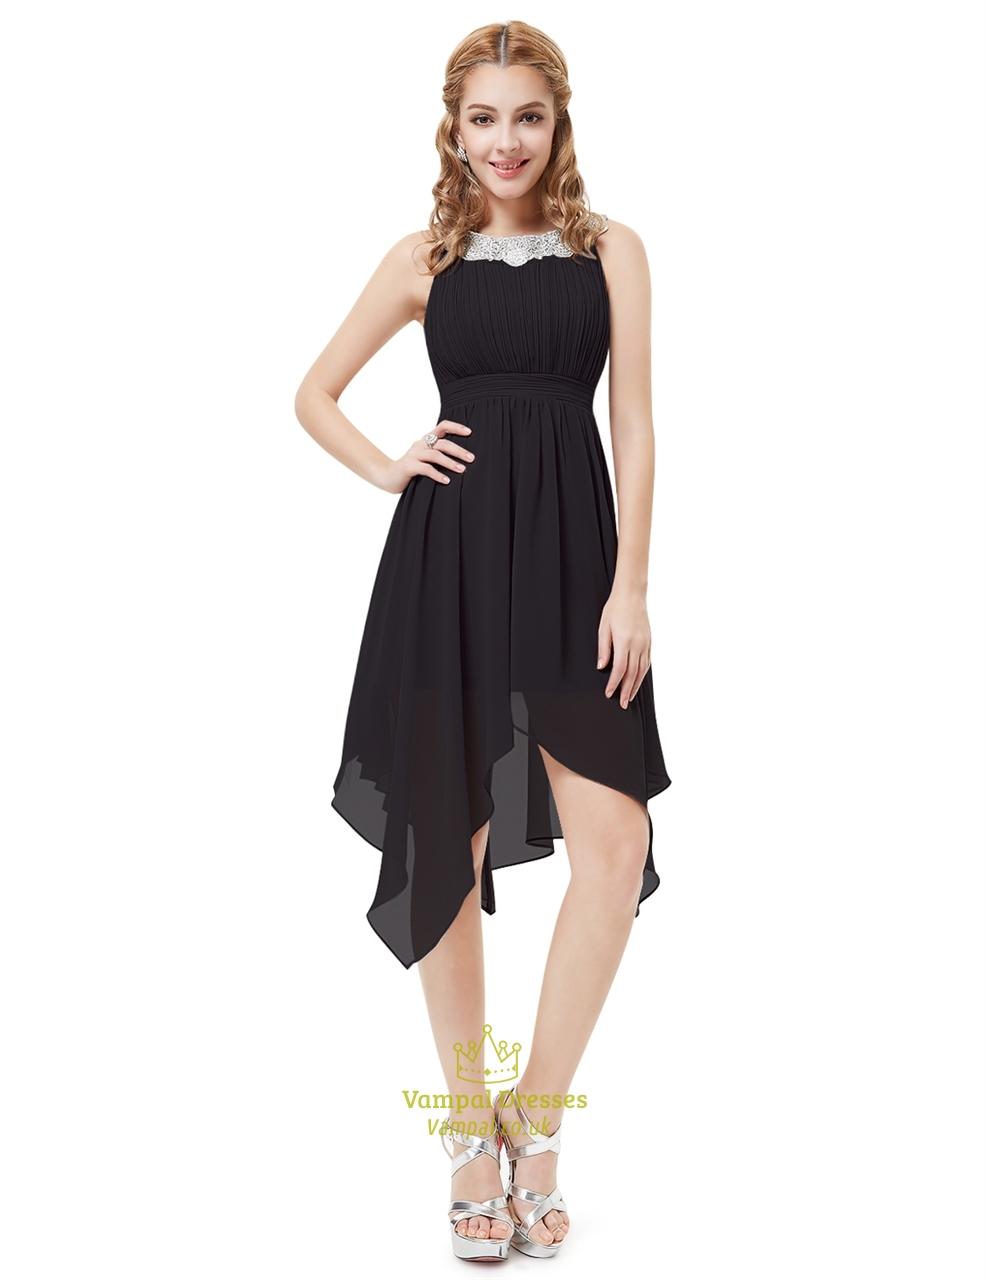 Black Chiffon Jewel Embellished Cocktail Dress | Vampal Dresses